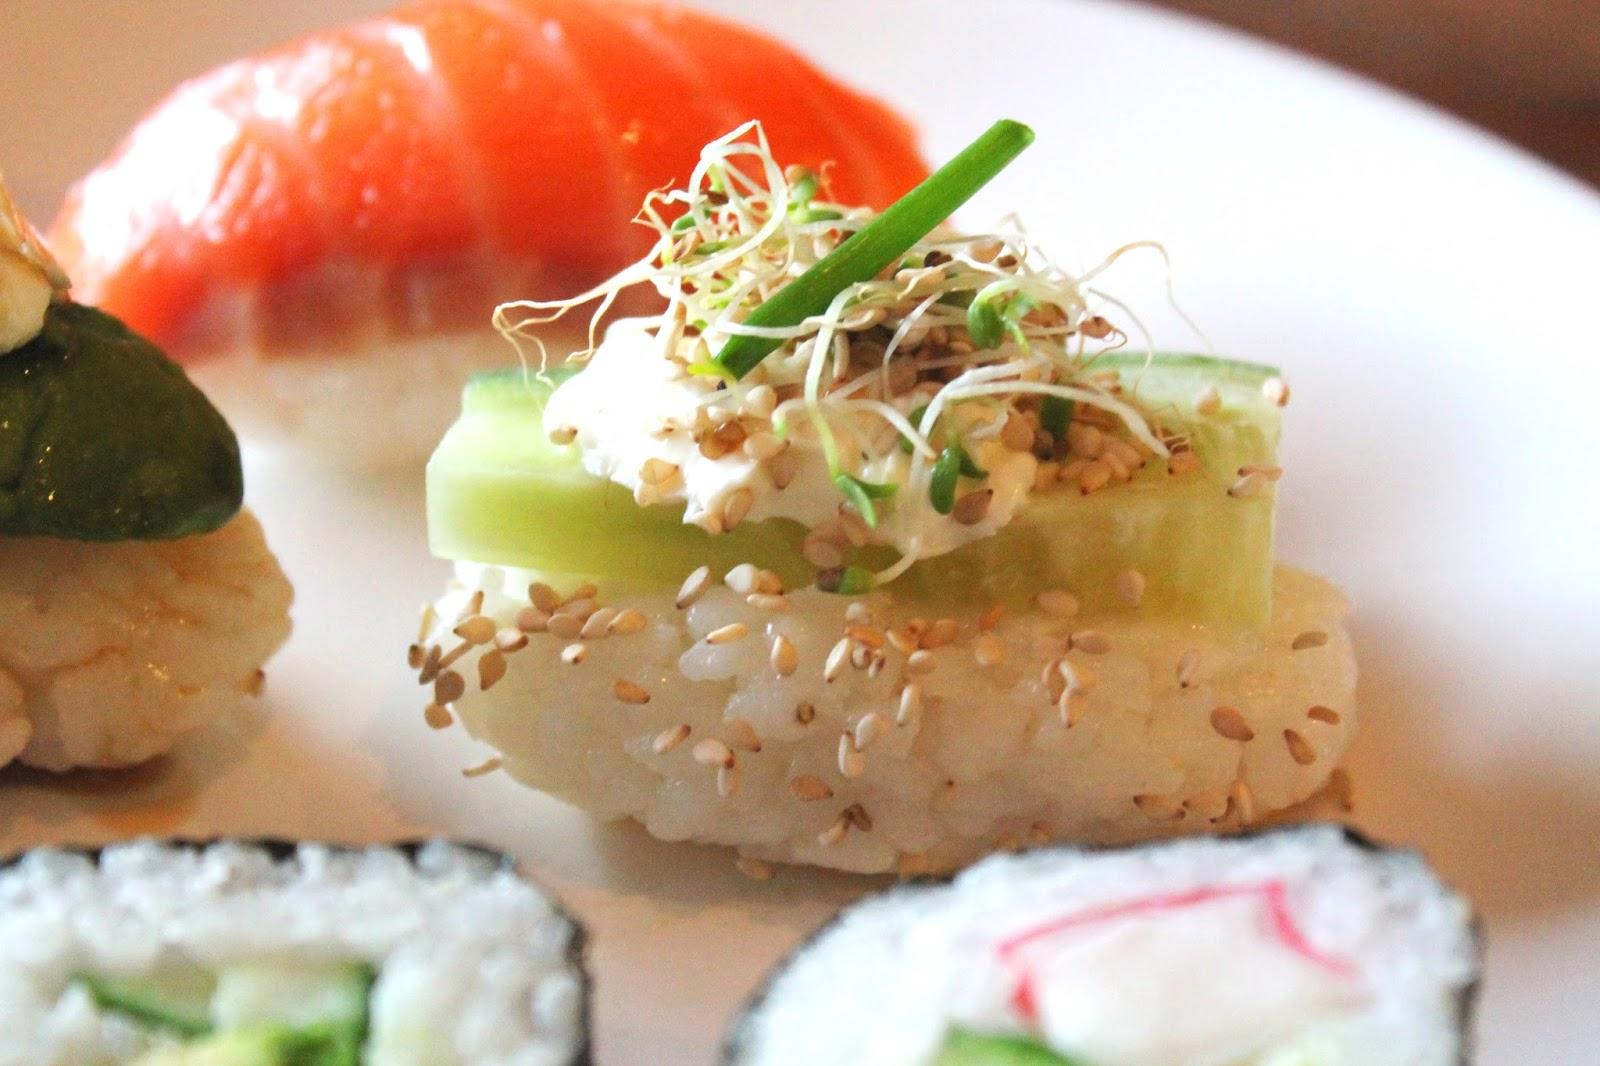 Homemade nigiri sushi | Alinan kotona blog